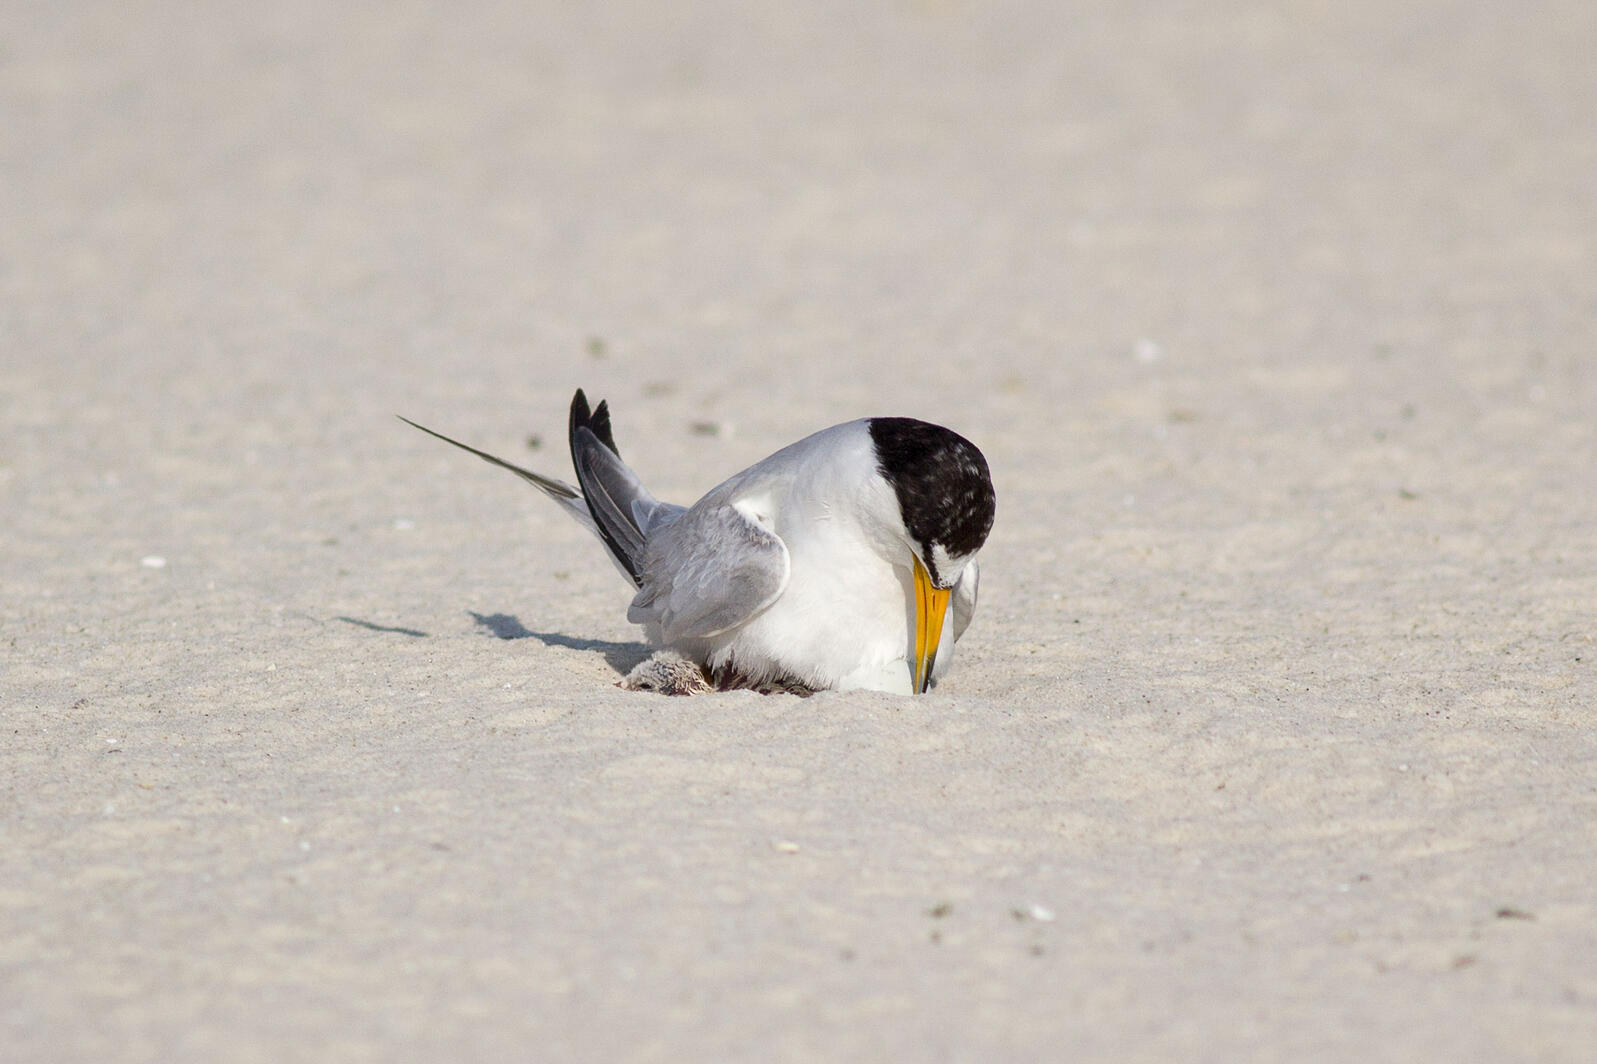 Least Tern tending to a newly hatched chick. Katie Barnes/Birmingham Audubon